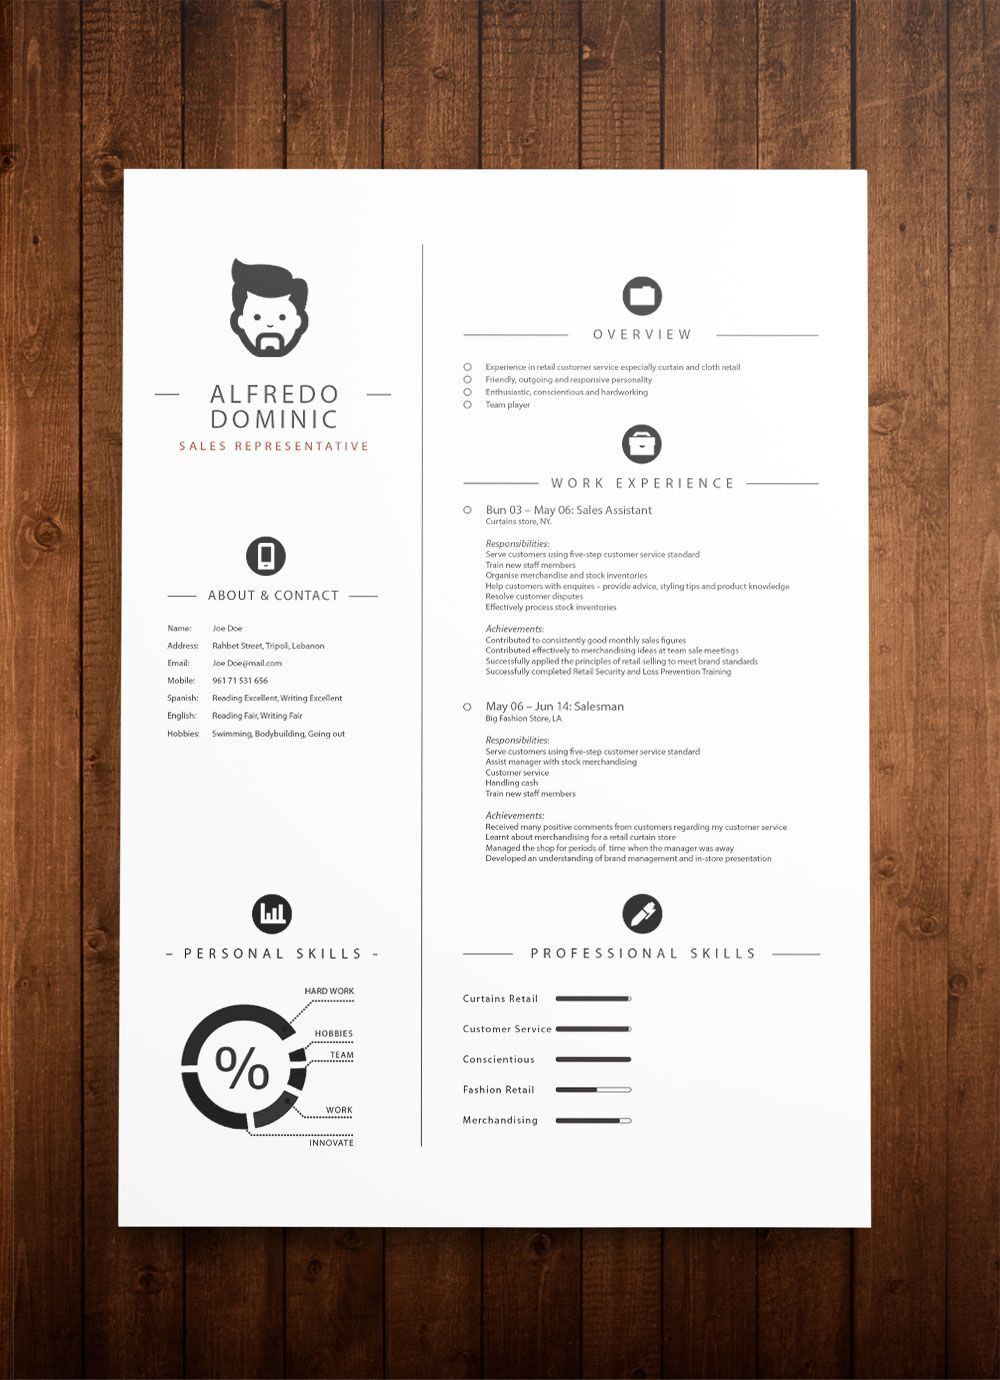 Resume Sample Modern Design Standard CV Resume Templates Resume ...